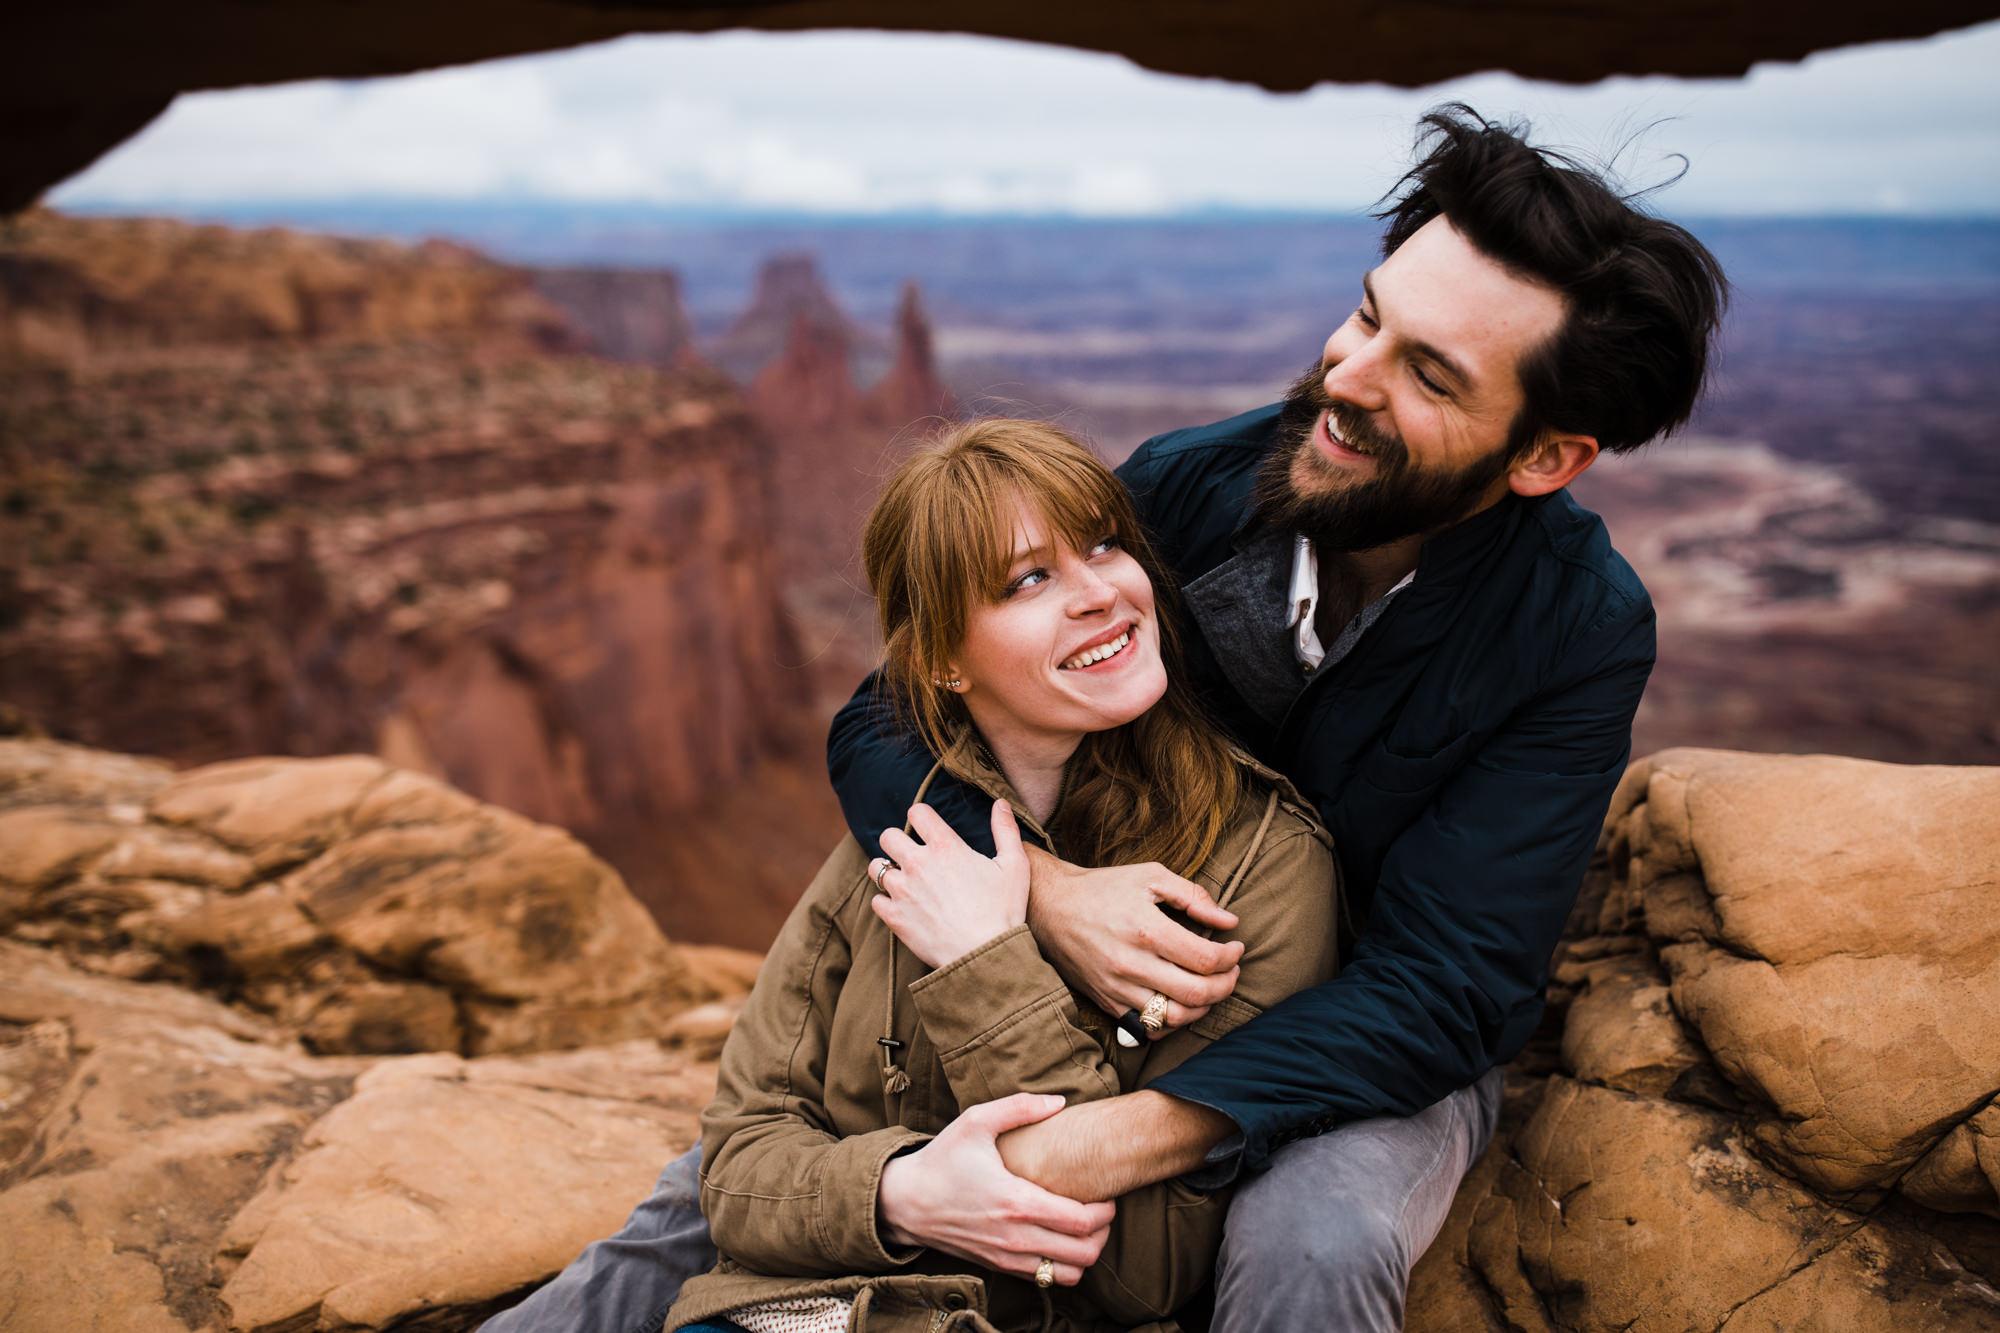 moab utah anniversary session | destination engagement photo inspiration | utah adventure elopement photographers | the hearnes adventure photography | www.thehearnes.com